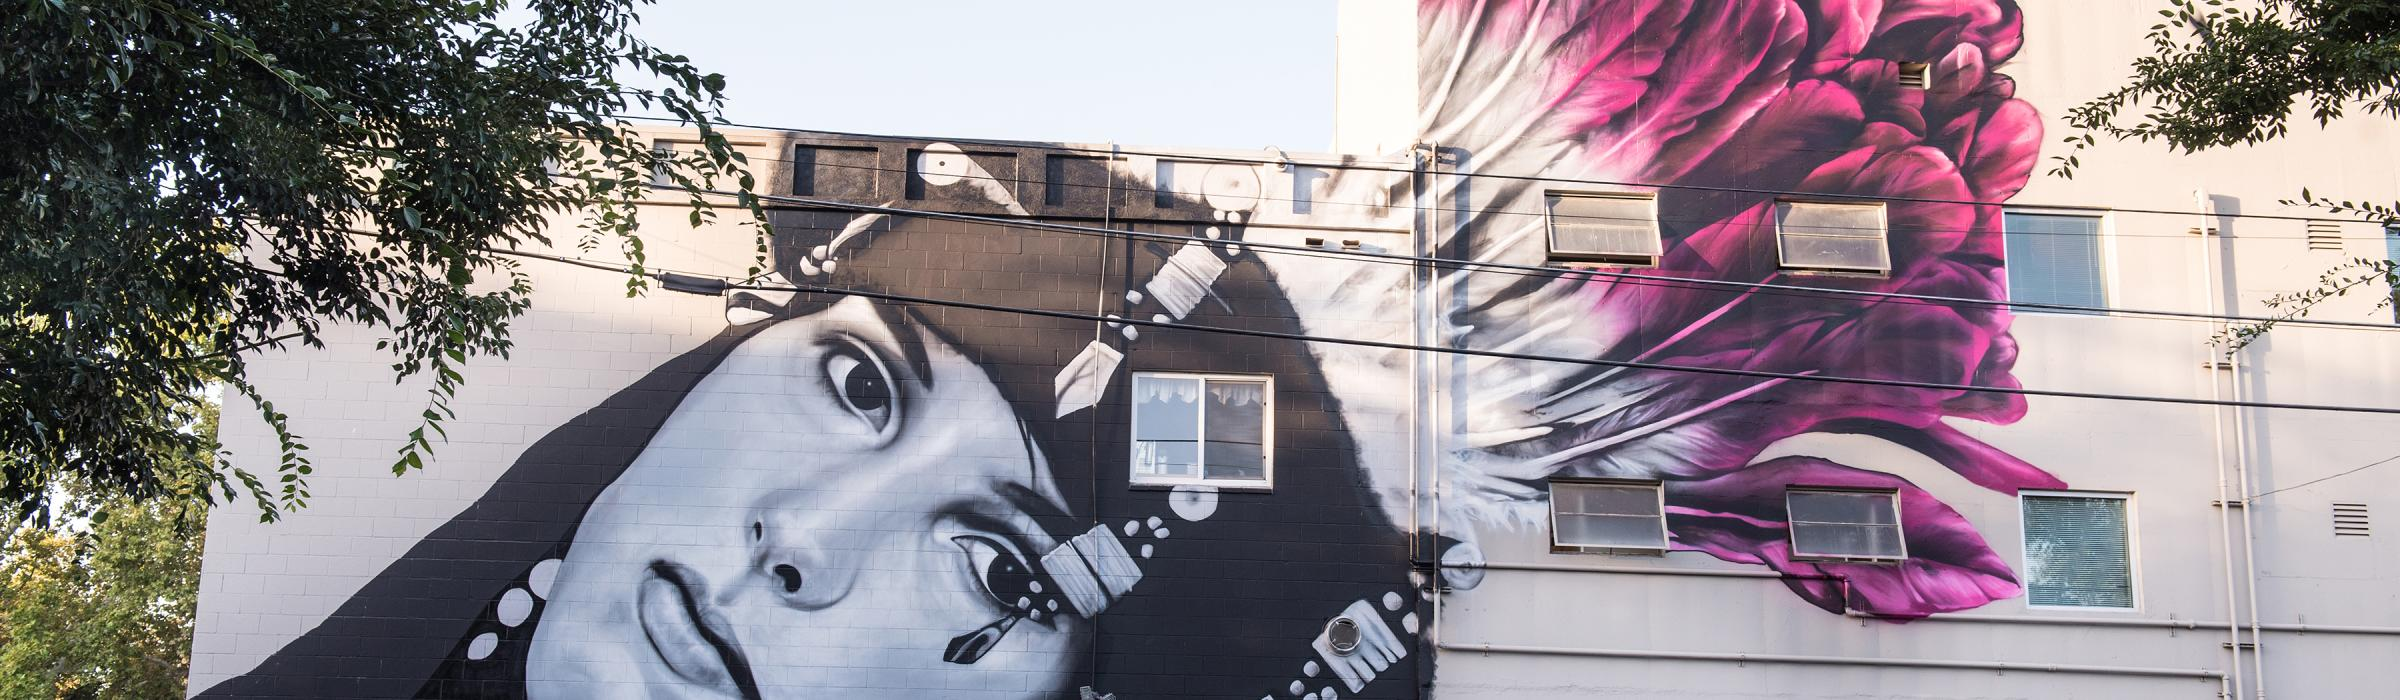 Sac Mural Fest